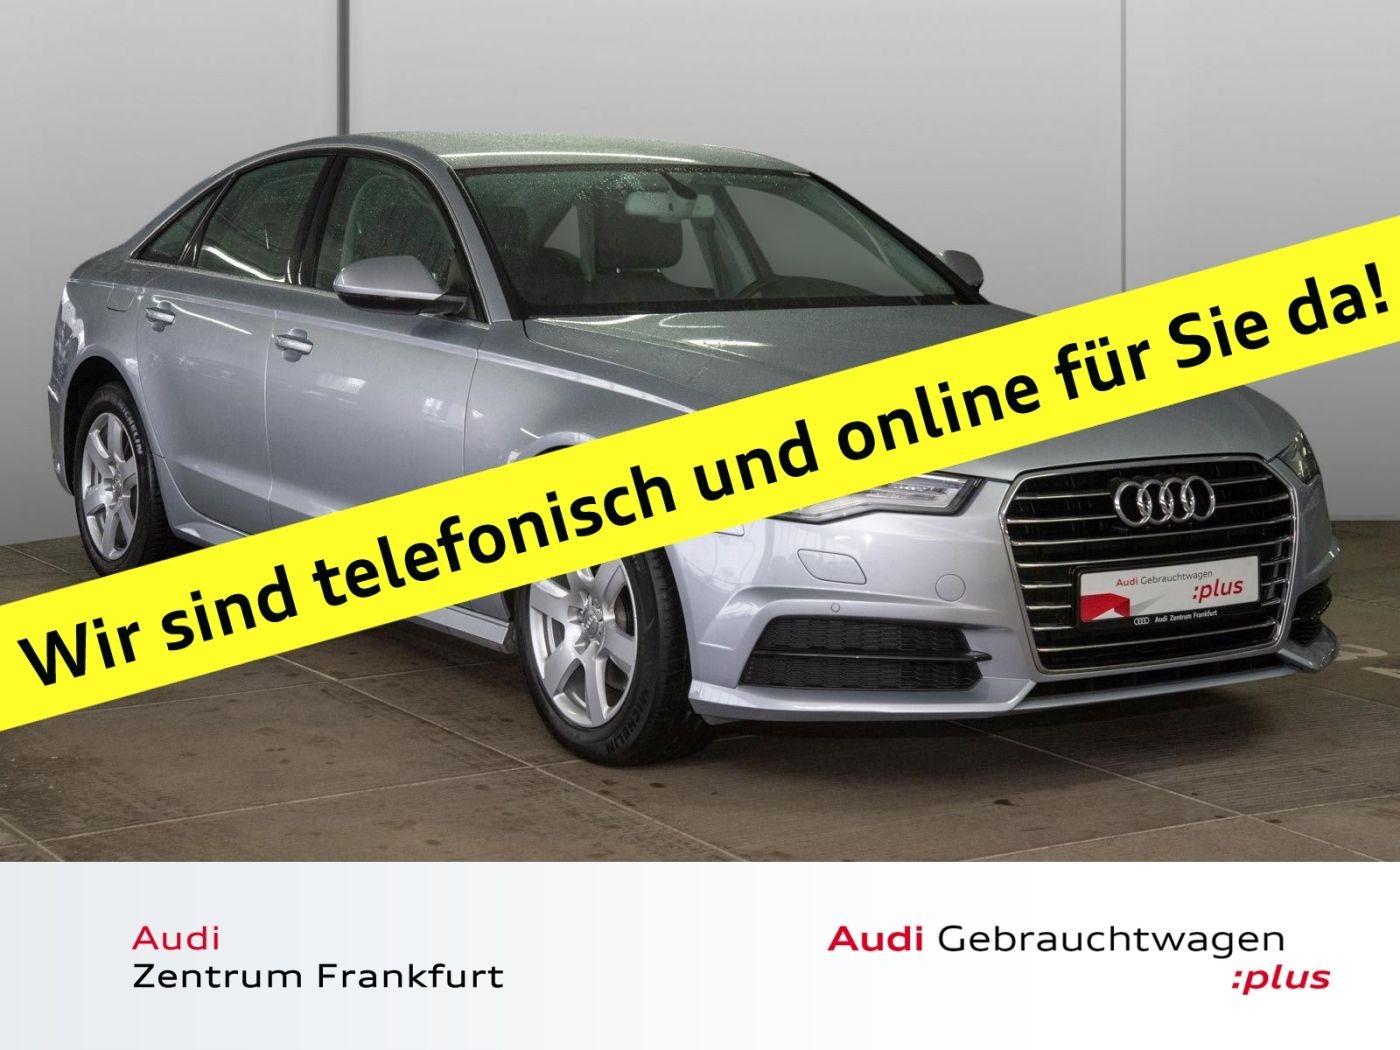 Audi A6 2.0 TDI Xenon Navi Tempomat PDC Sitzheizung, Jahr 2017, Diesel